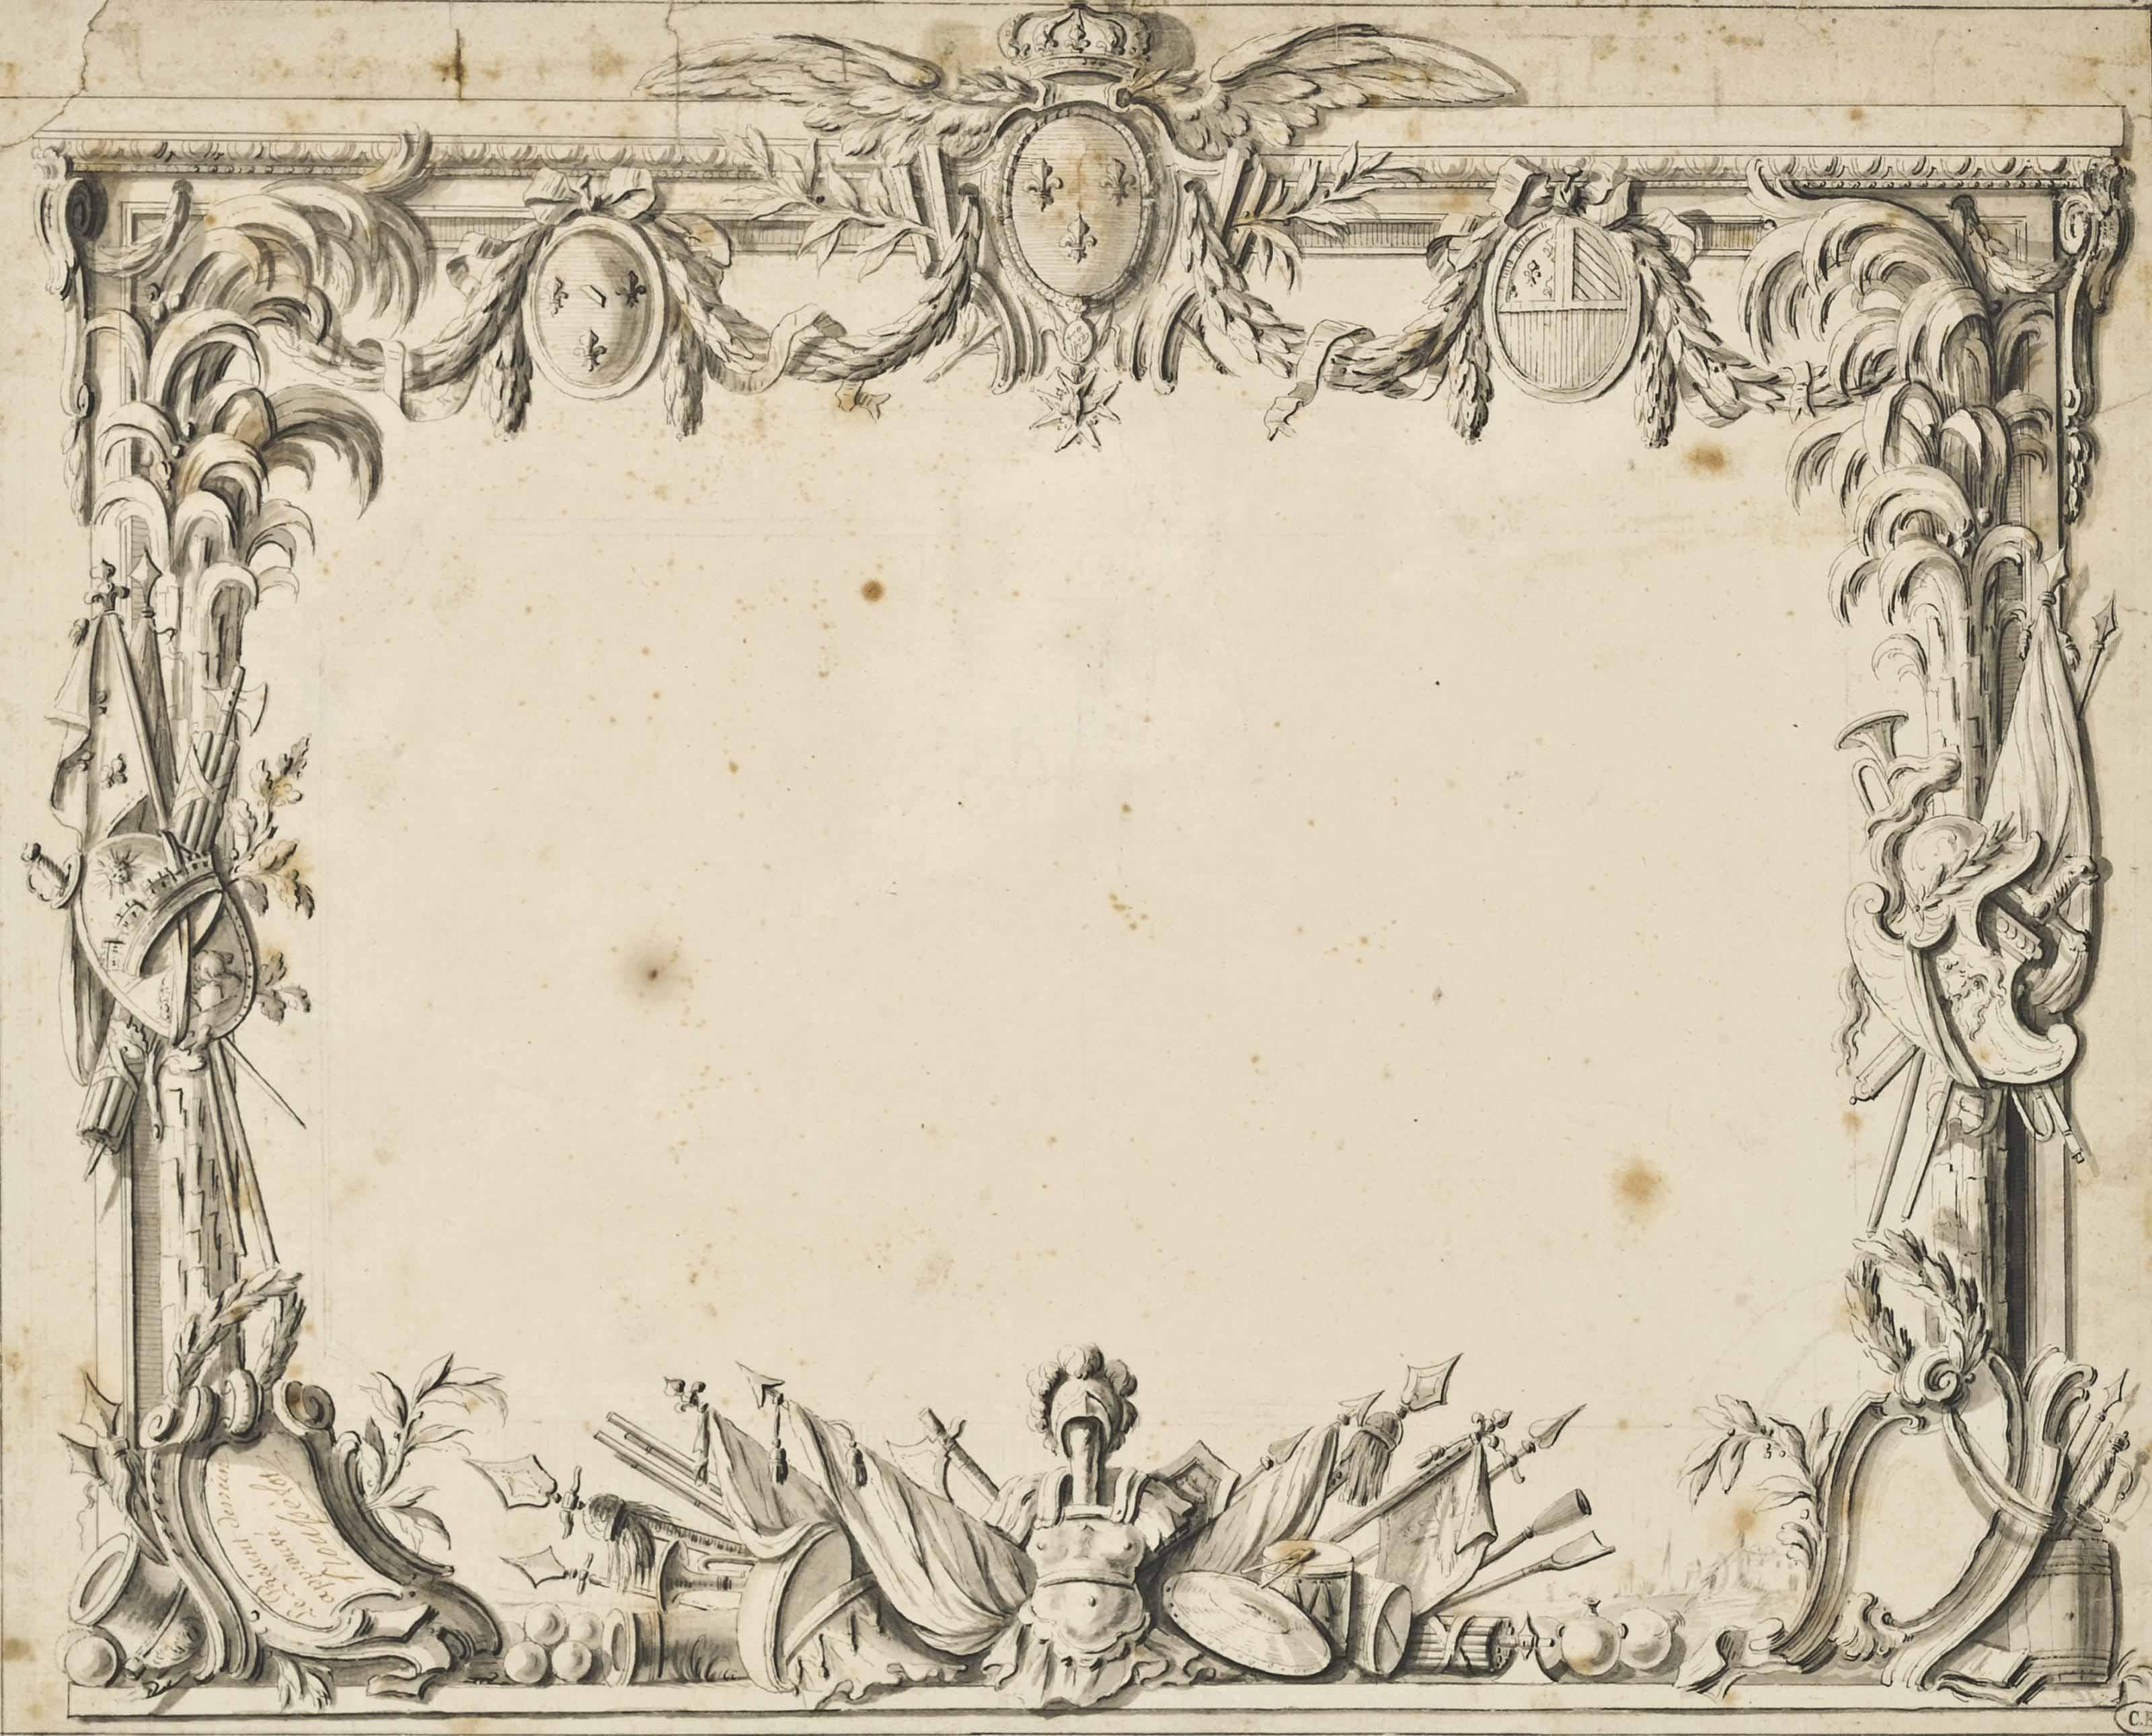 Louis Gabriel Monnier (1733-18